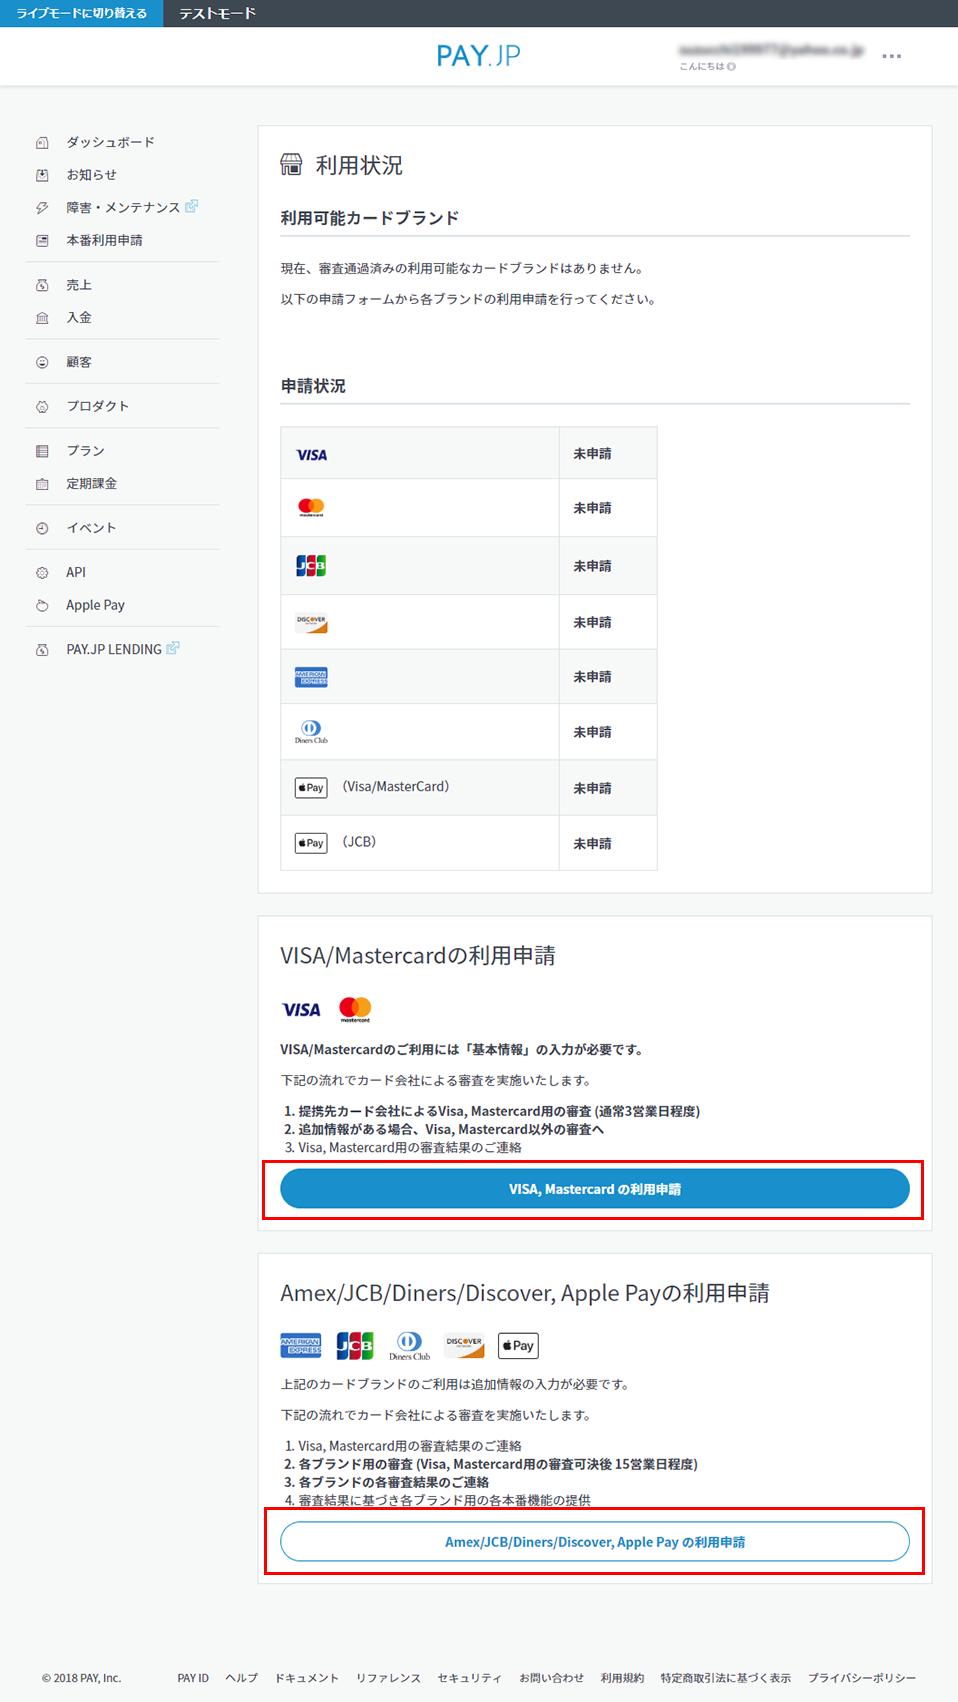 pay.jp利用申請